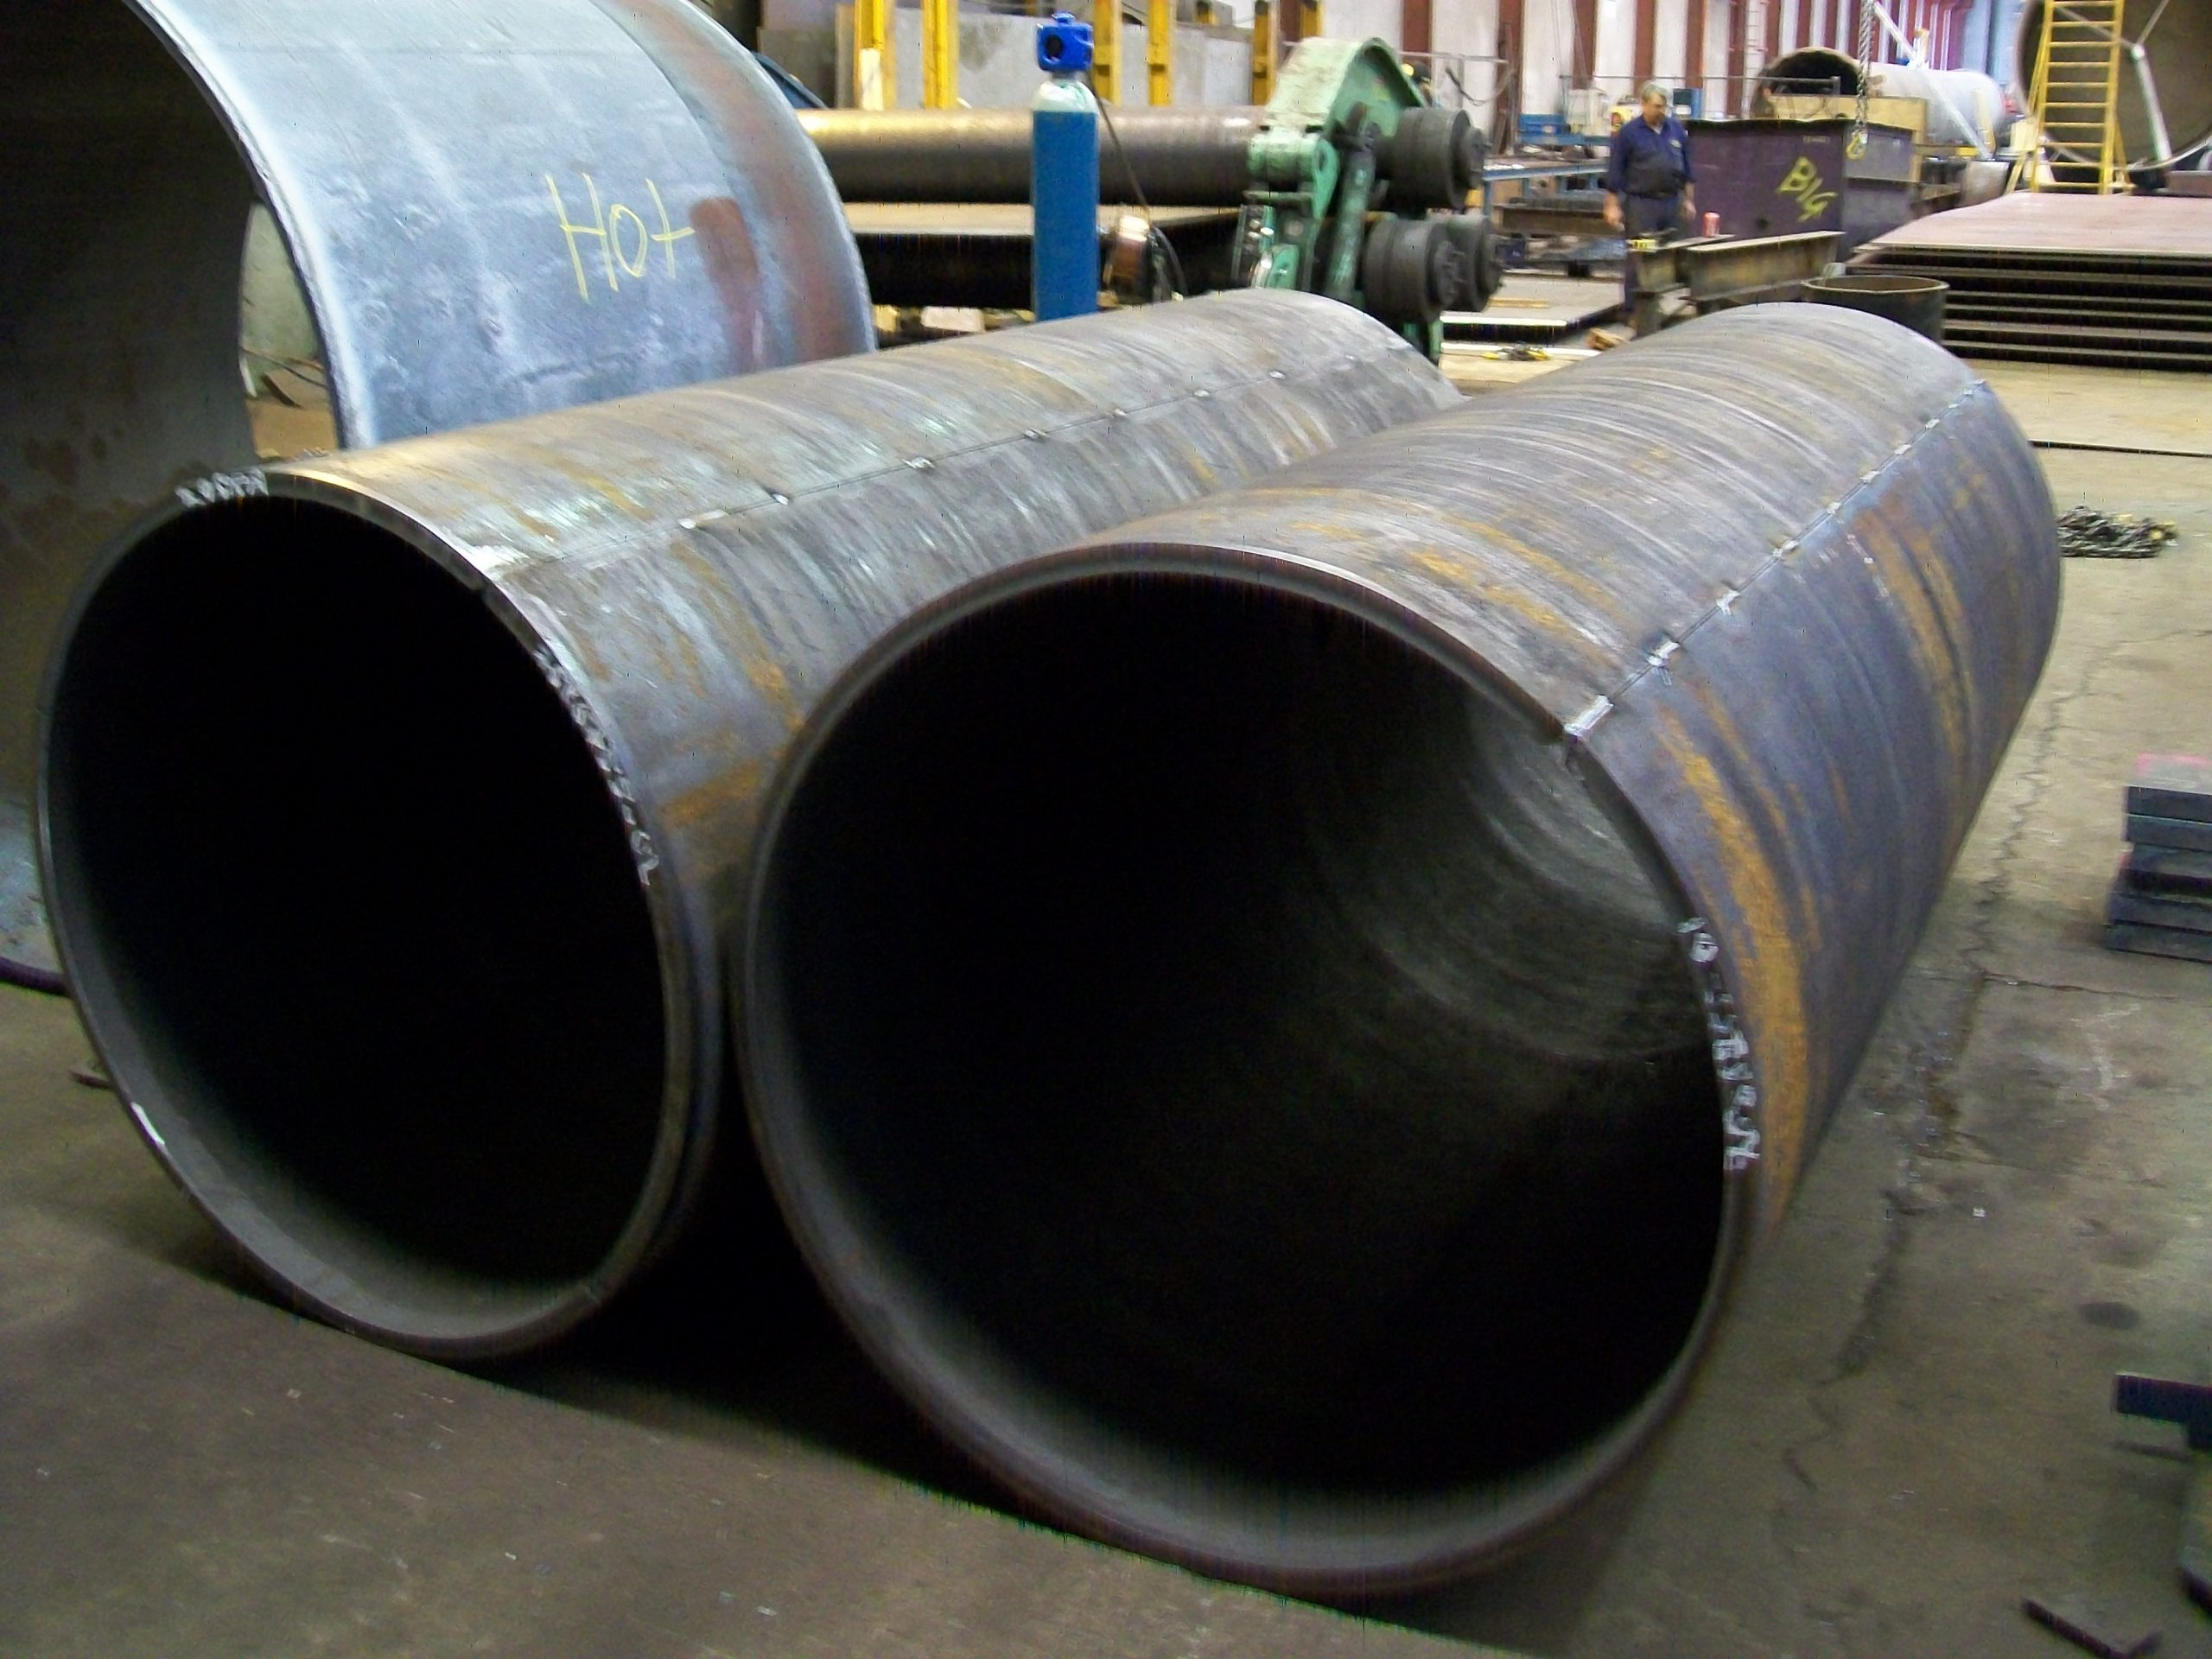 LA2955 - Joy Mining, Rolled _ tacked (004, 2012-05-11)